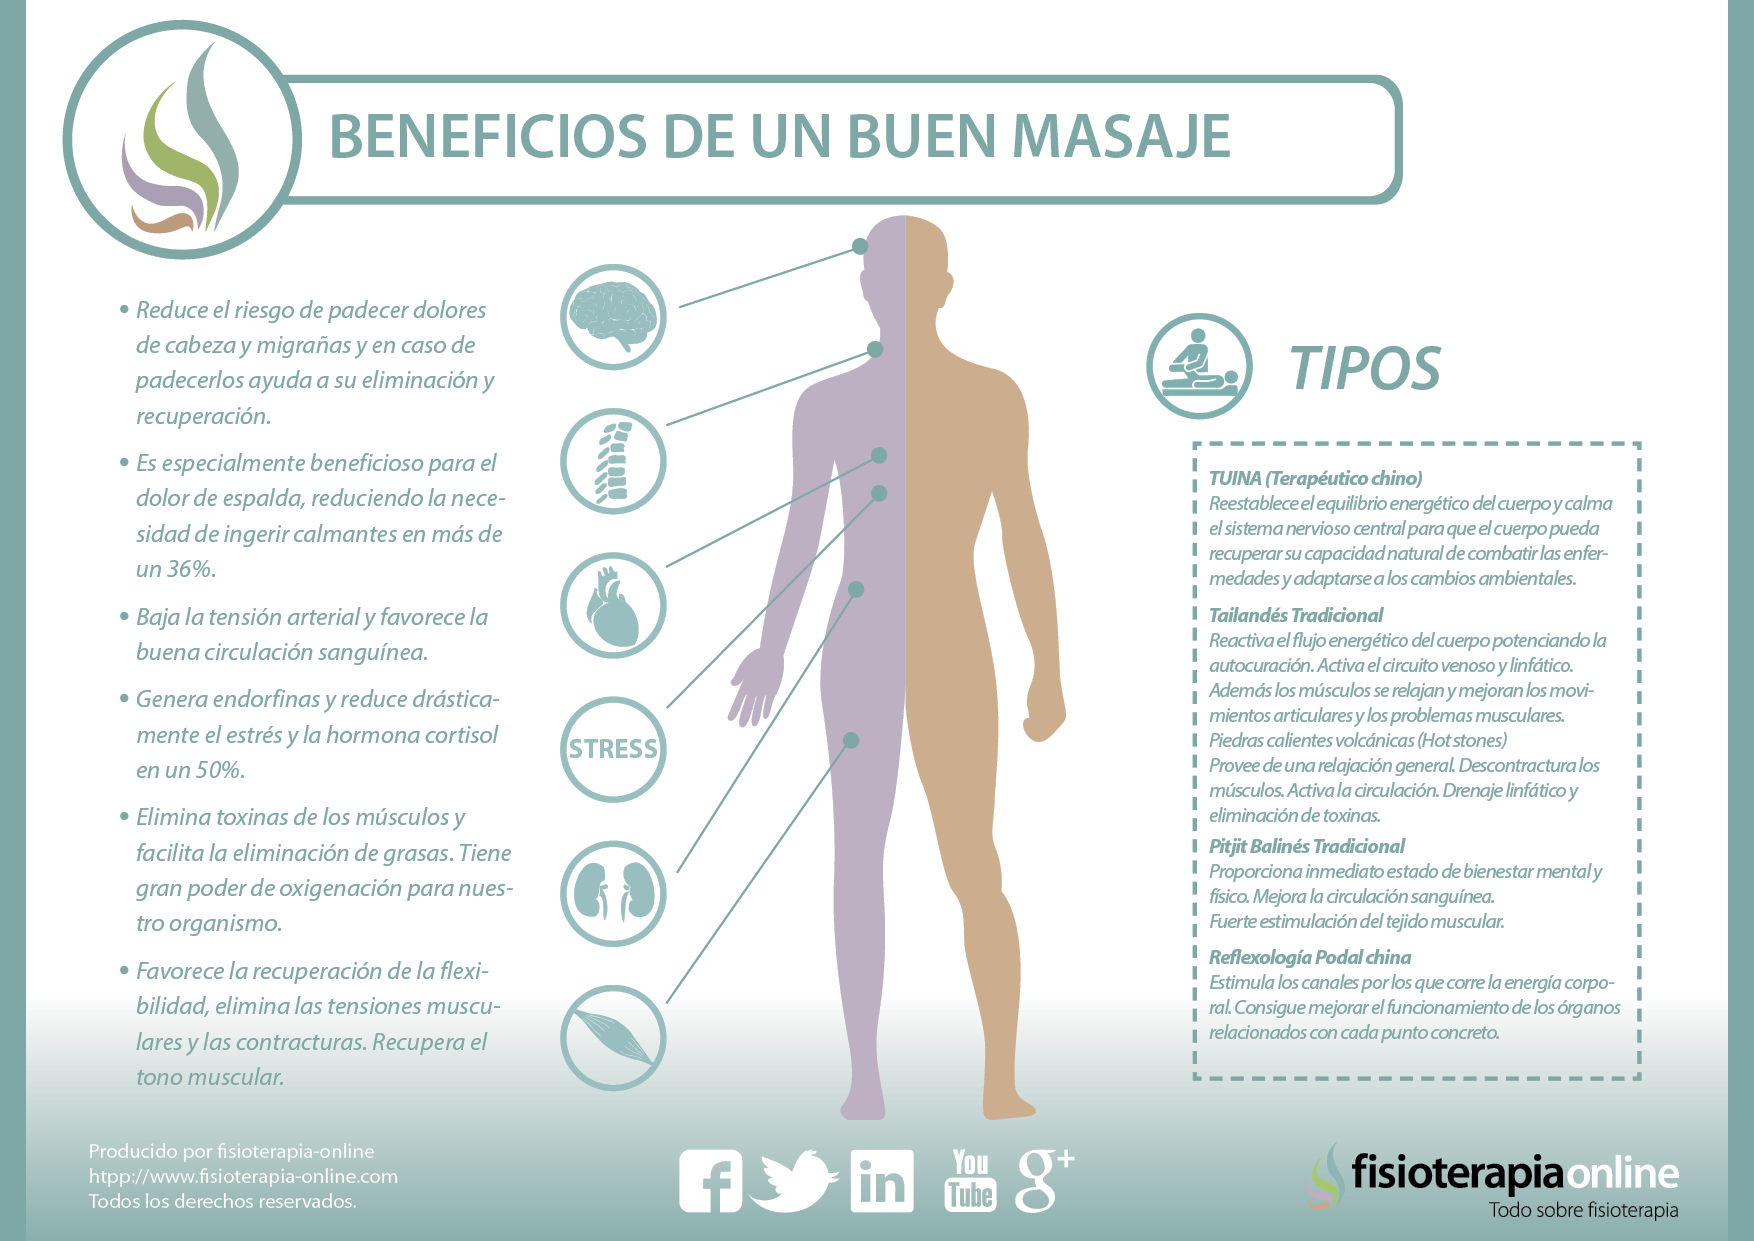 Beneficios de un buen masaje